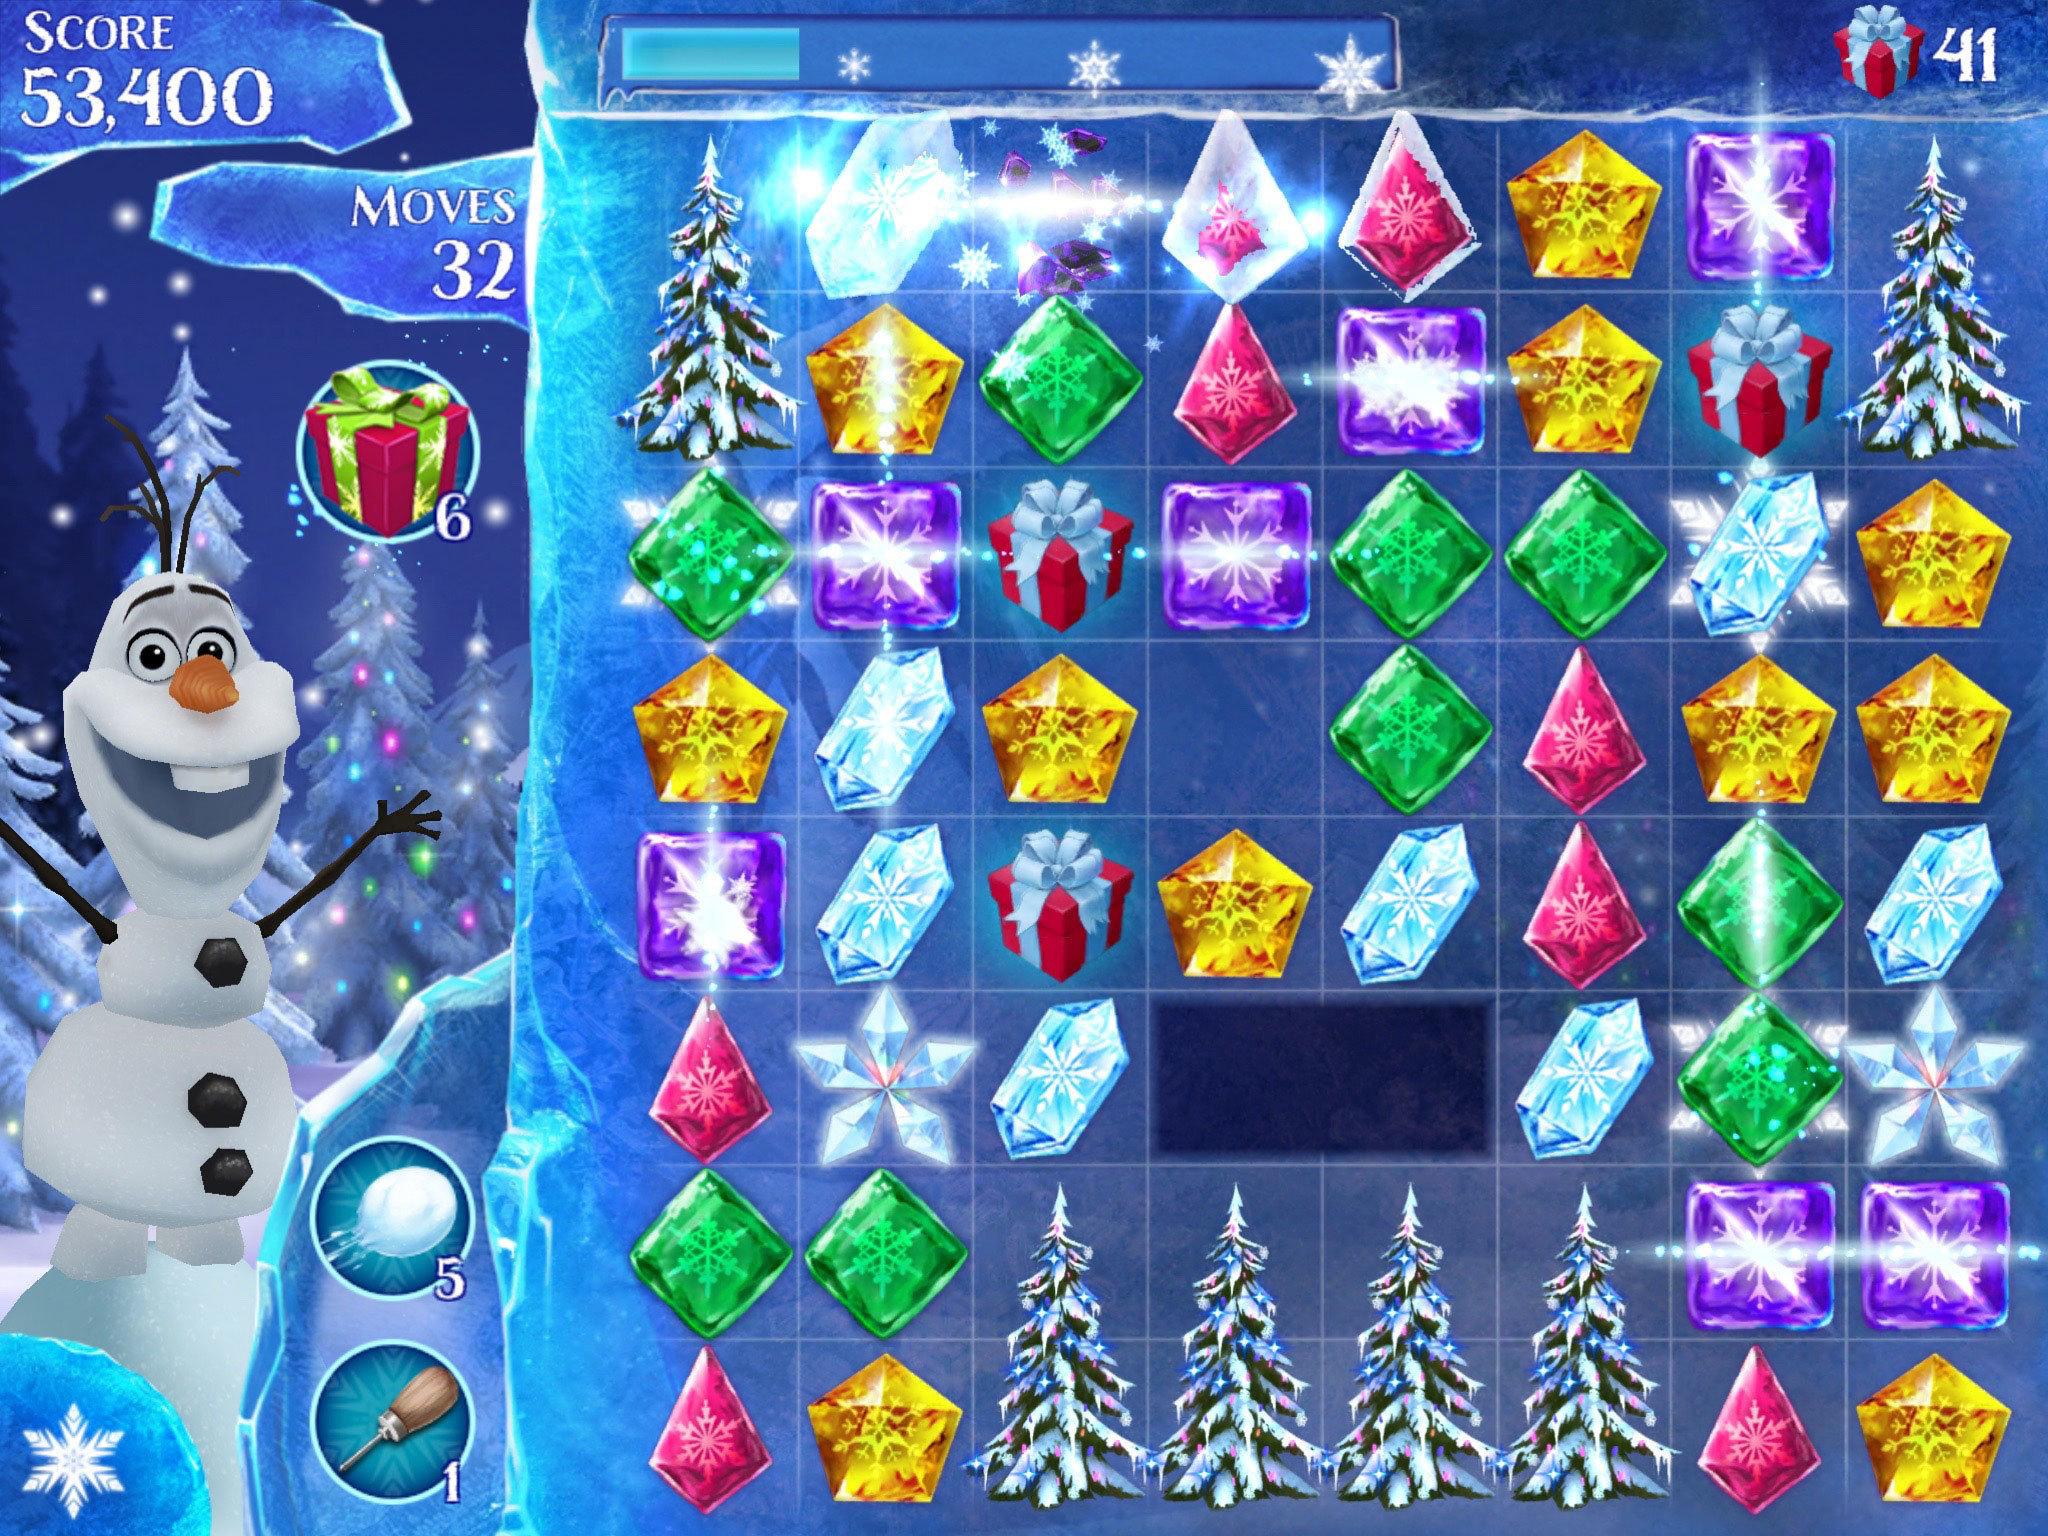 Frozen Free Fall - Screenshot Gallery